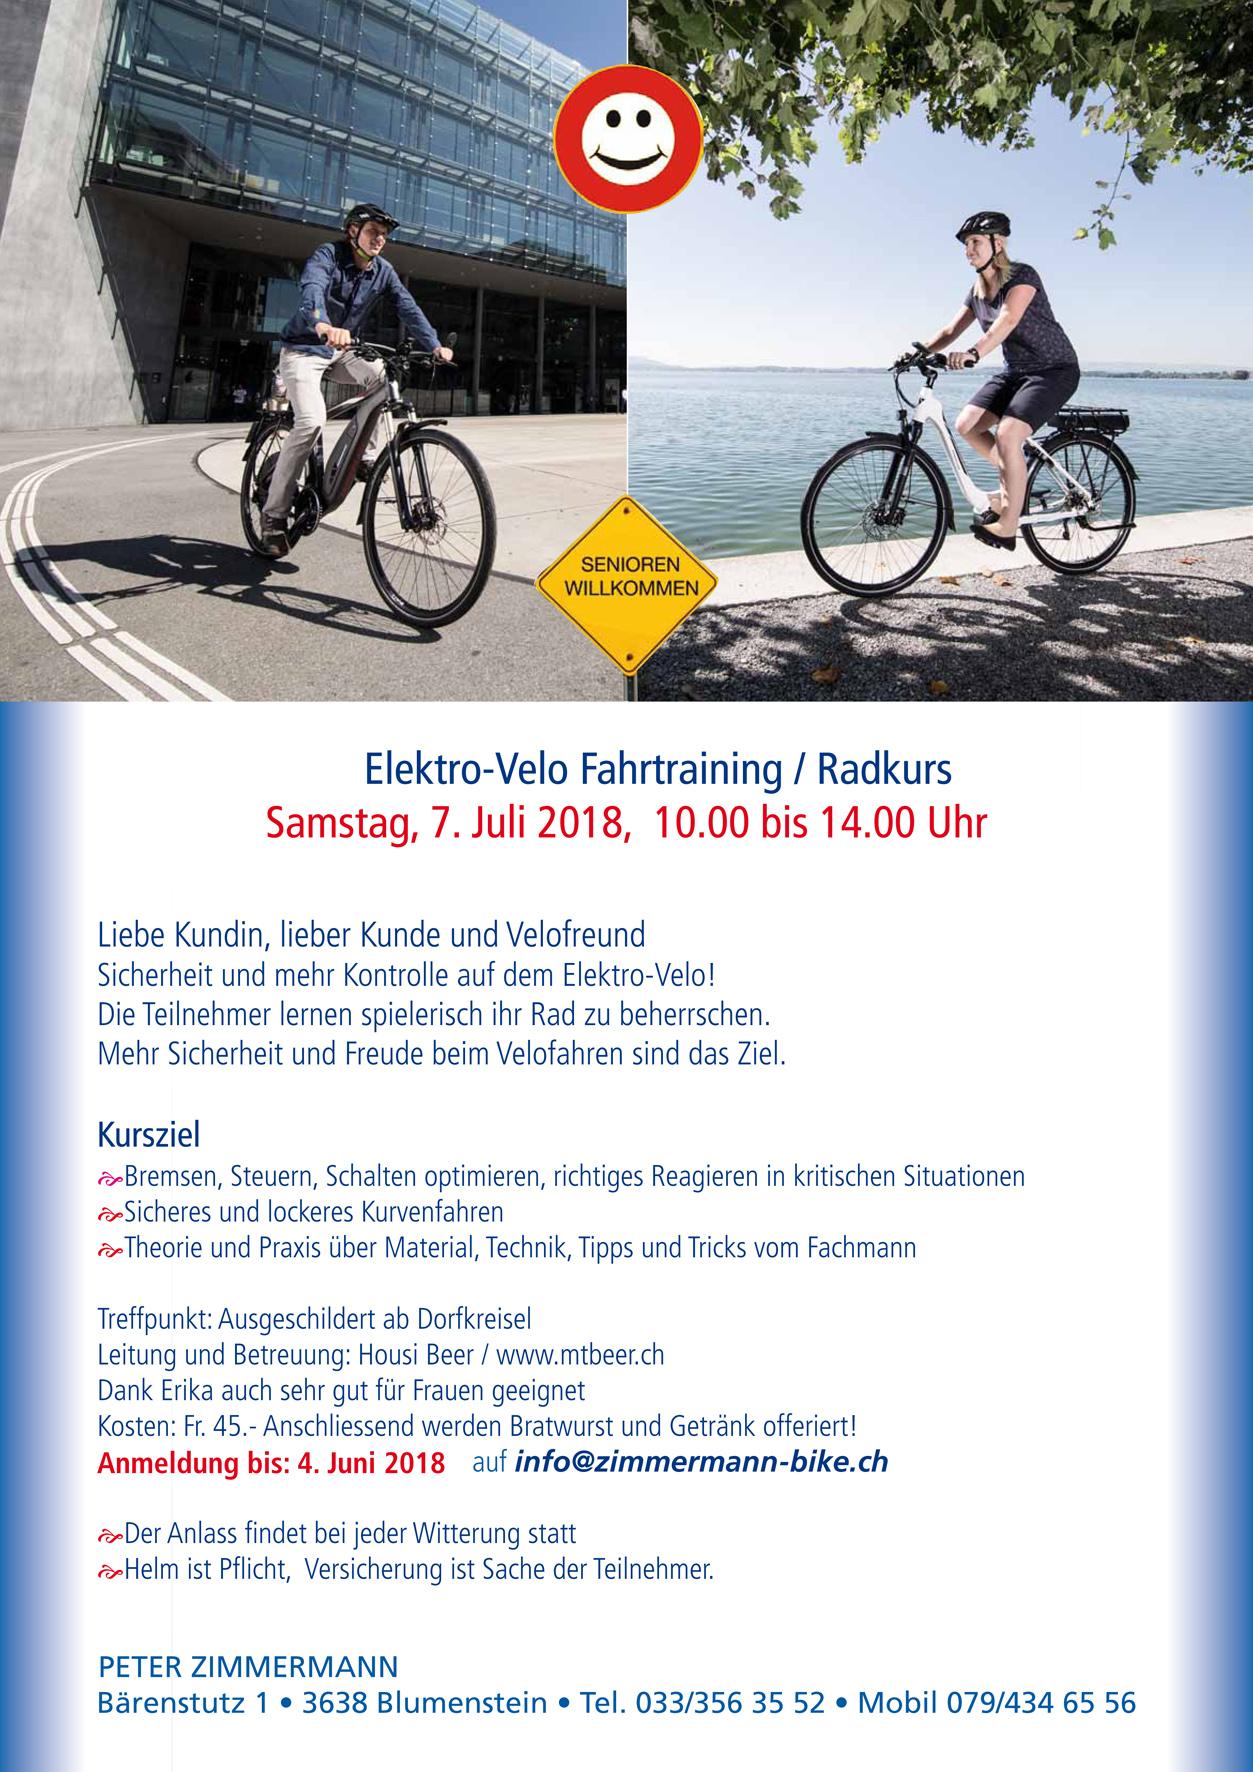 Elektro-Velo Fahrtrainingskurs | Zimmermann Bike Blumenstein